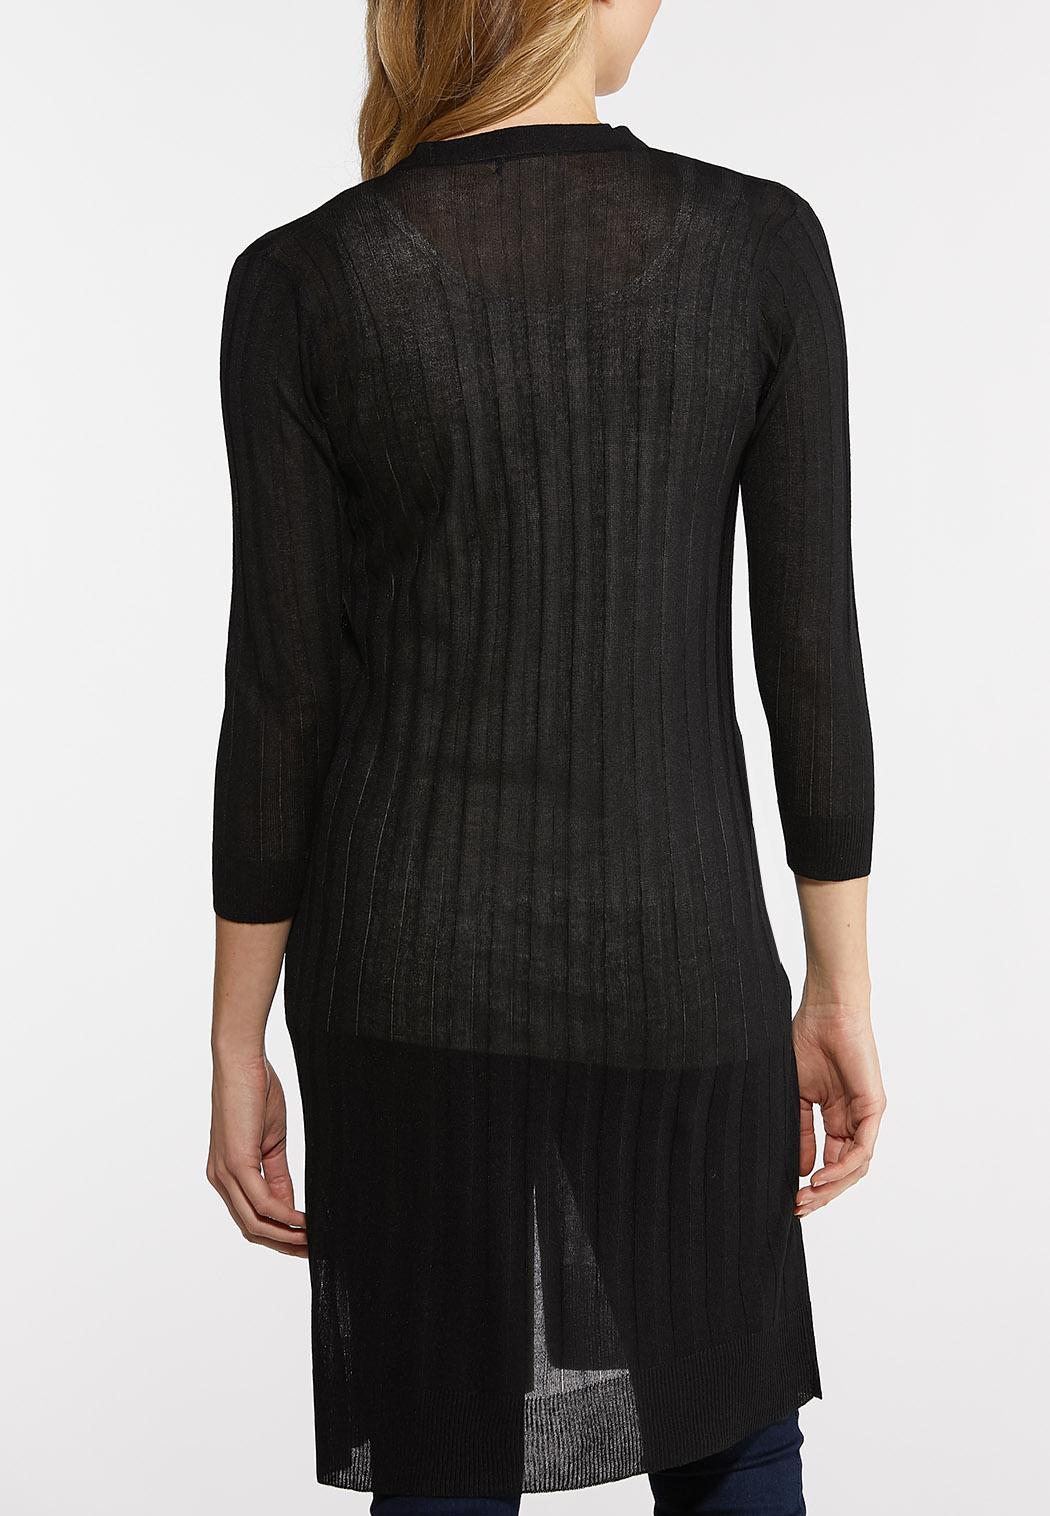 Plus Size Sheer Black Cardigan Sweater (Item #44109445)